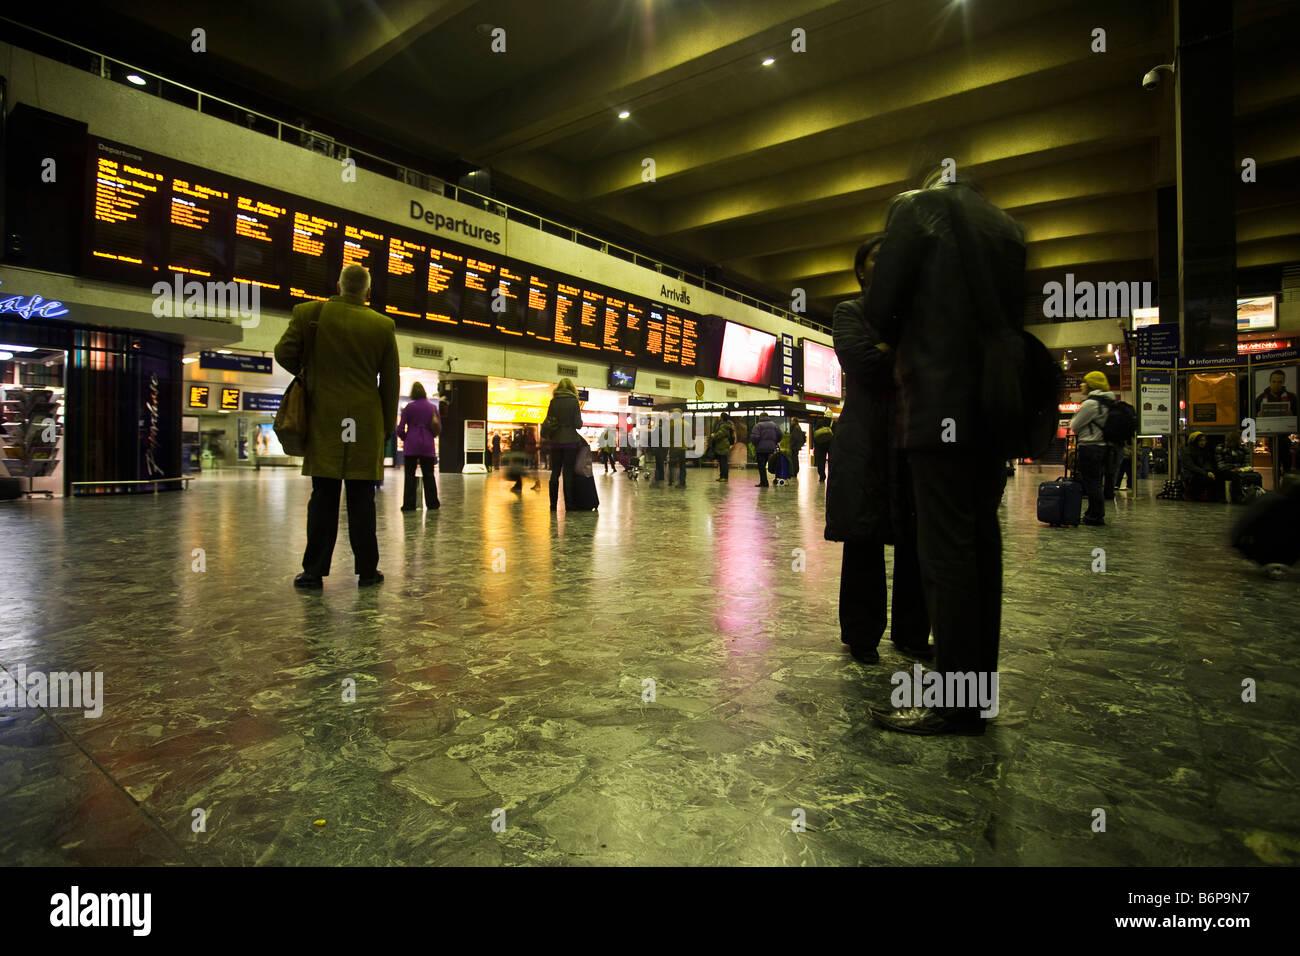 Euston Station Concourse Departure Hall London England UK United Kingdom GB Great Britain British Isles Europe - Stock Image